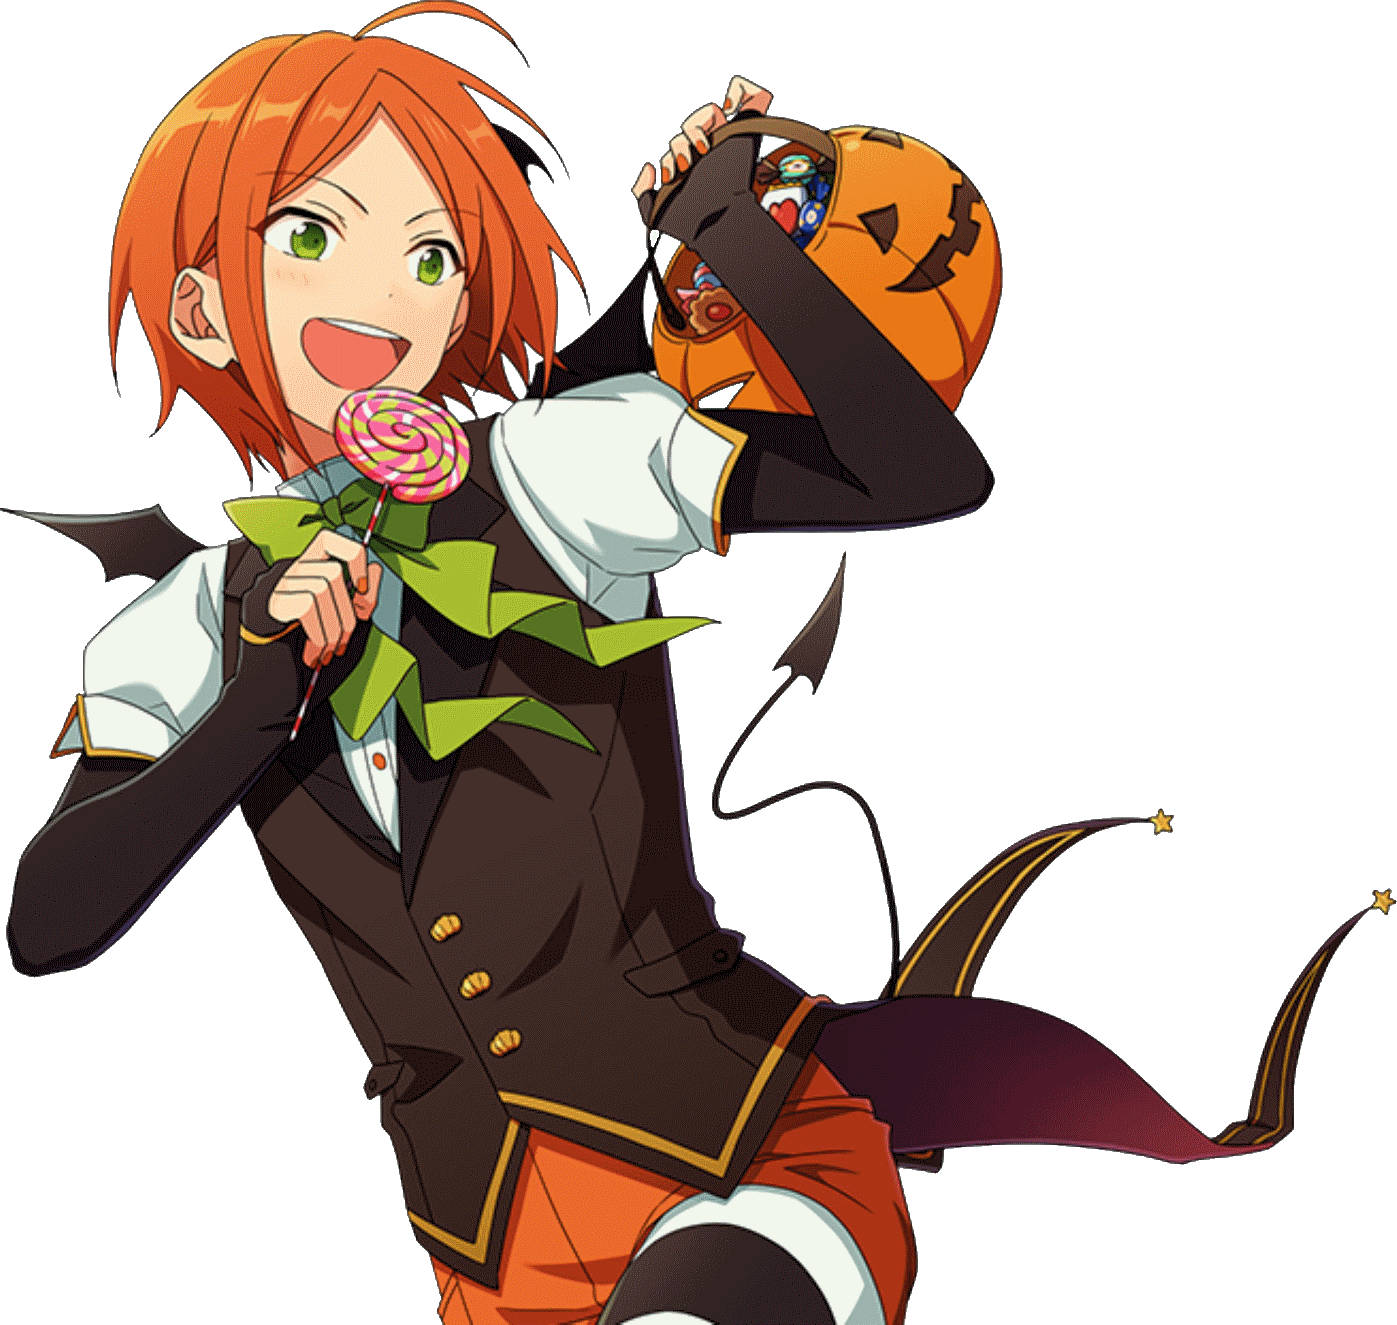 Halloween scout clipart clip art freeuse stock Image - Hinata Aoi Halloween Dialogue Render.png | The English ... clip art freeuse stock